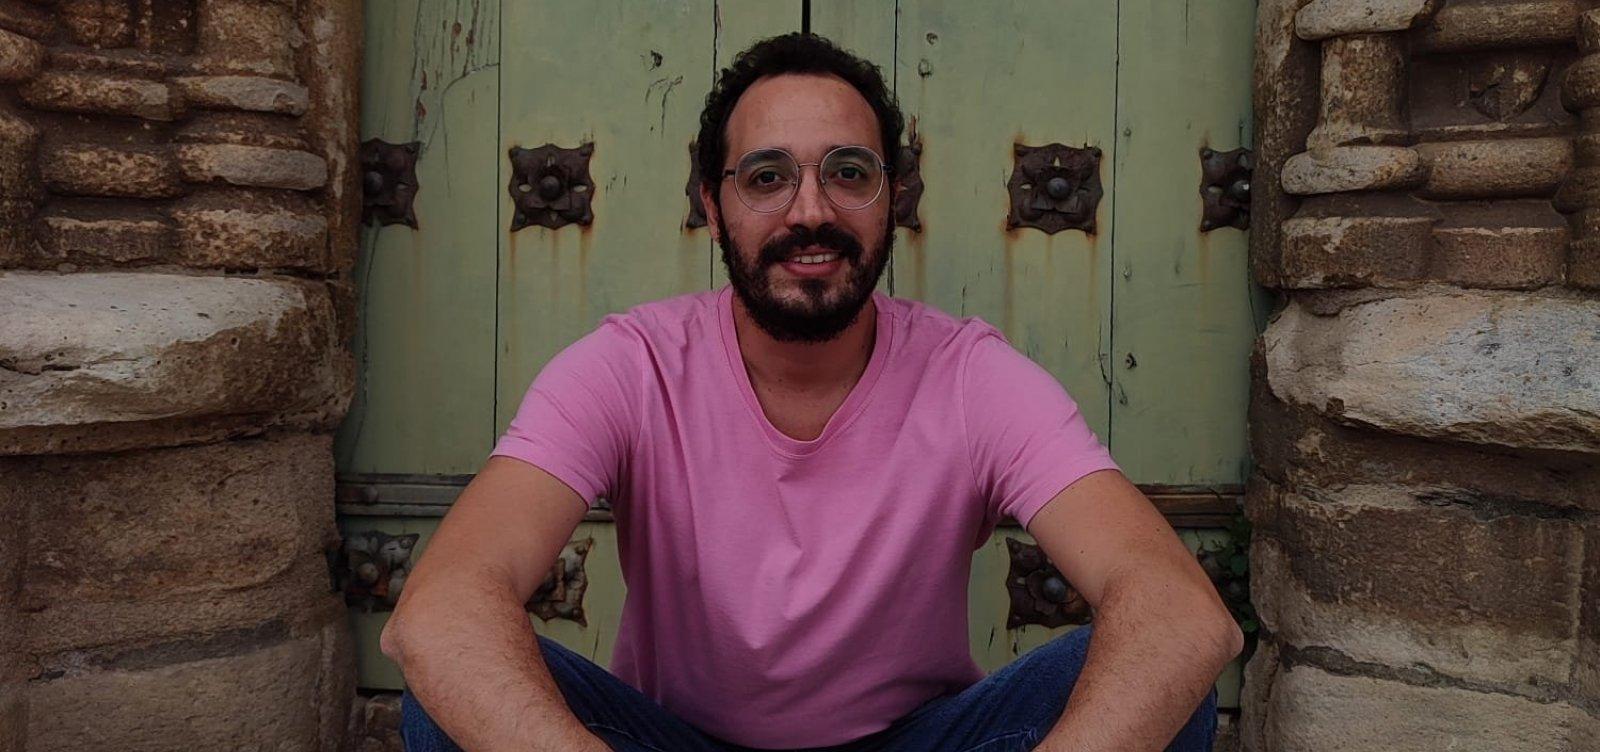 Ator baiano vai a Portugal para encenar clássico de Shakespeare